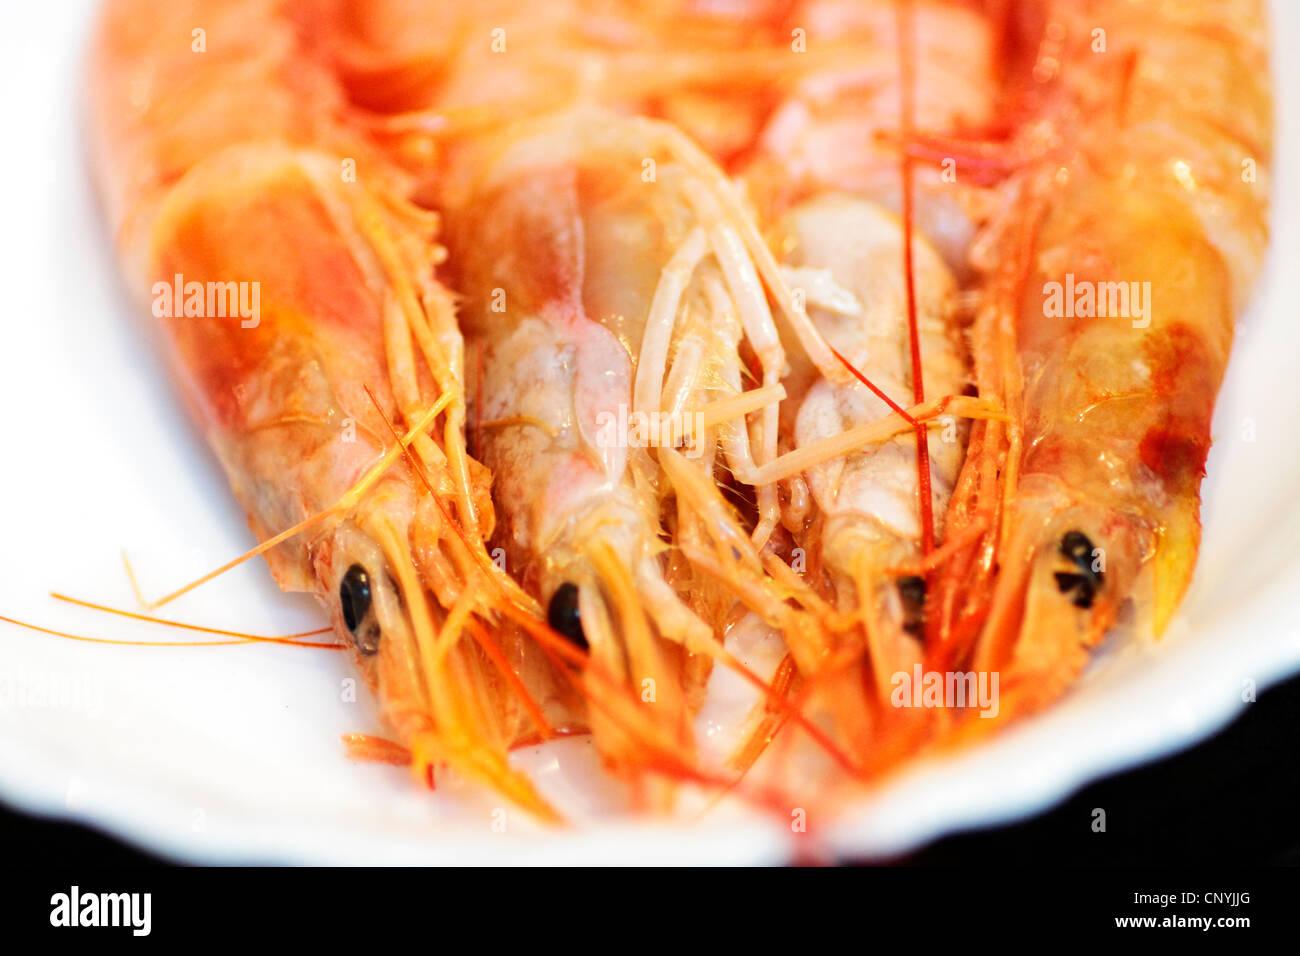 seafood, food, prawn, crustacean, snack, cuisine, orange, fried, prepared, ingredient, plate, gourmet, delicious, grill, barbecu Stock Photo